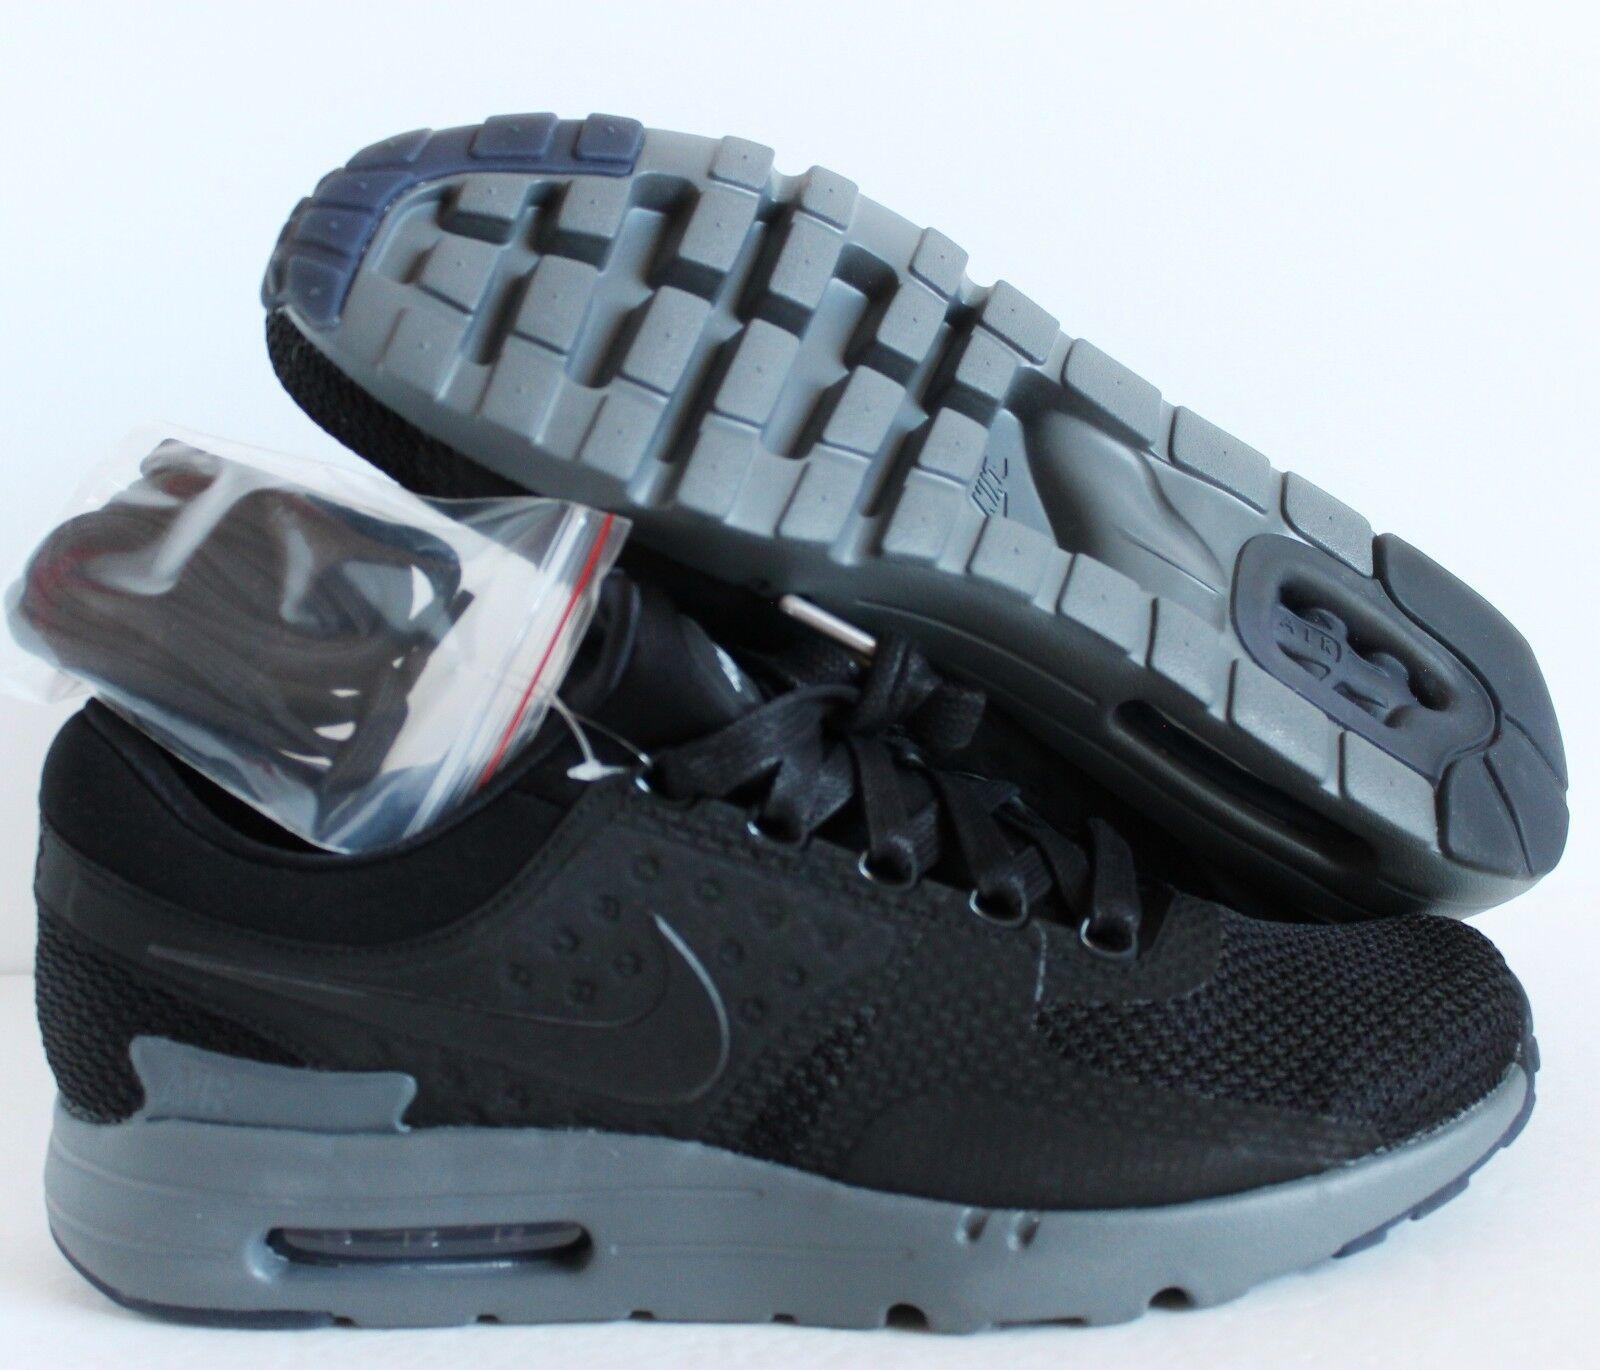 Nike air zero max zero air qs nero-dark grey sz 12 [789695-001] a57c99